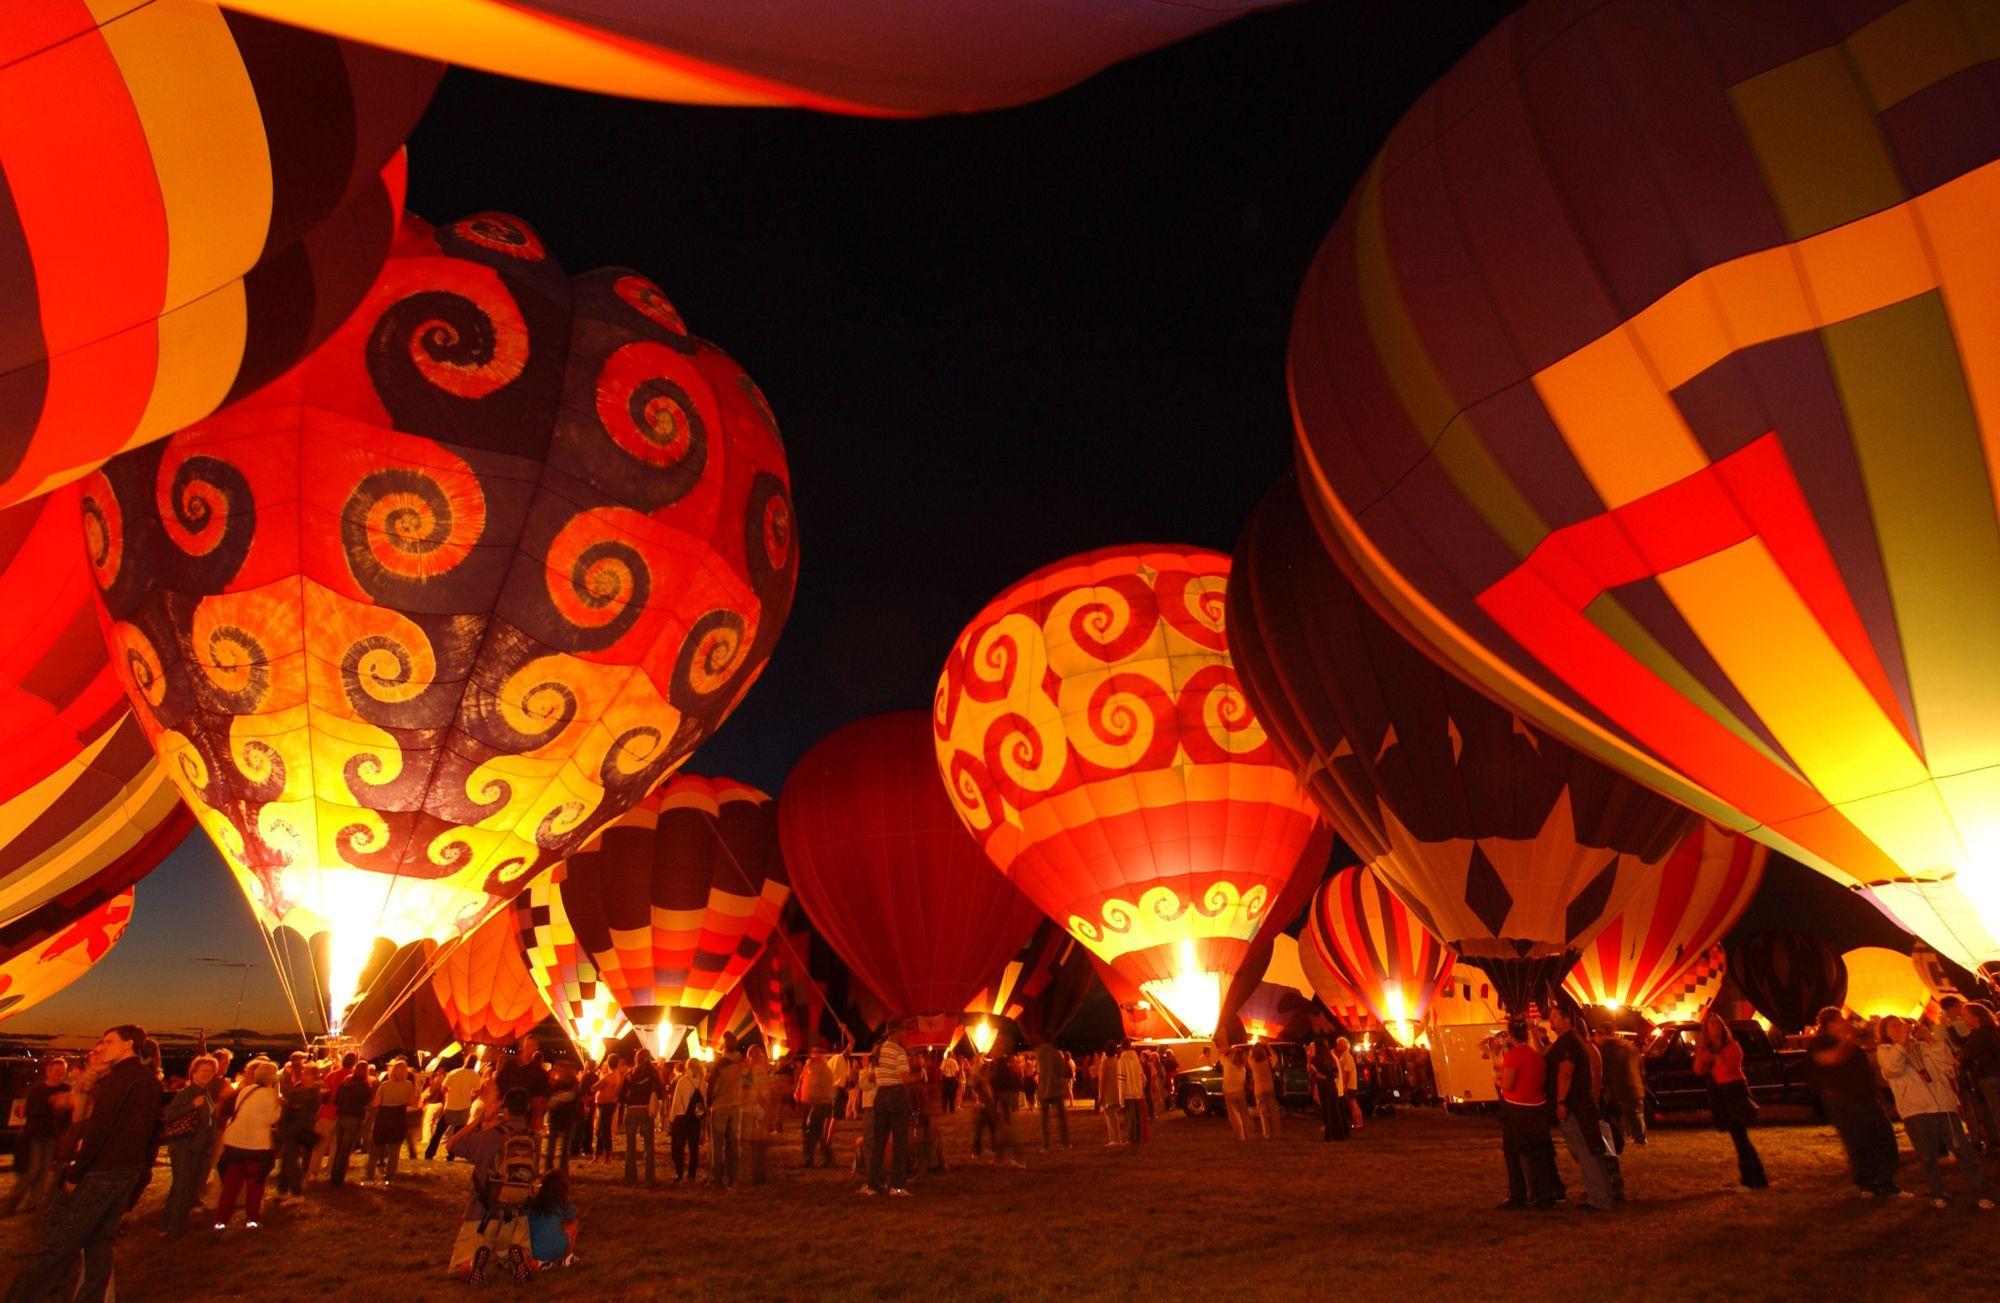 50 Greatest Festivals In The World Air Balloon Festival Hot Air Balloon Festival Albuquerque Balloon Fiesta